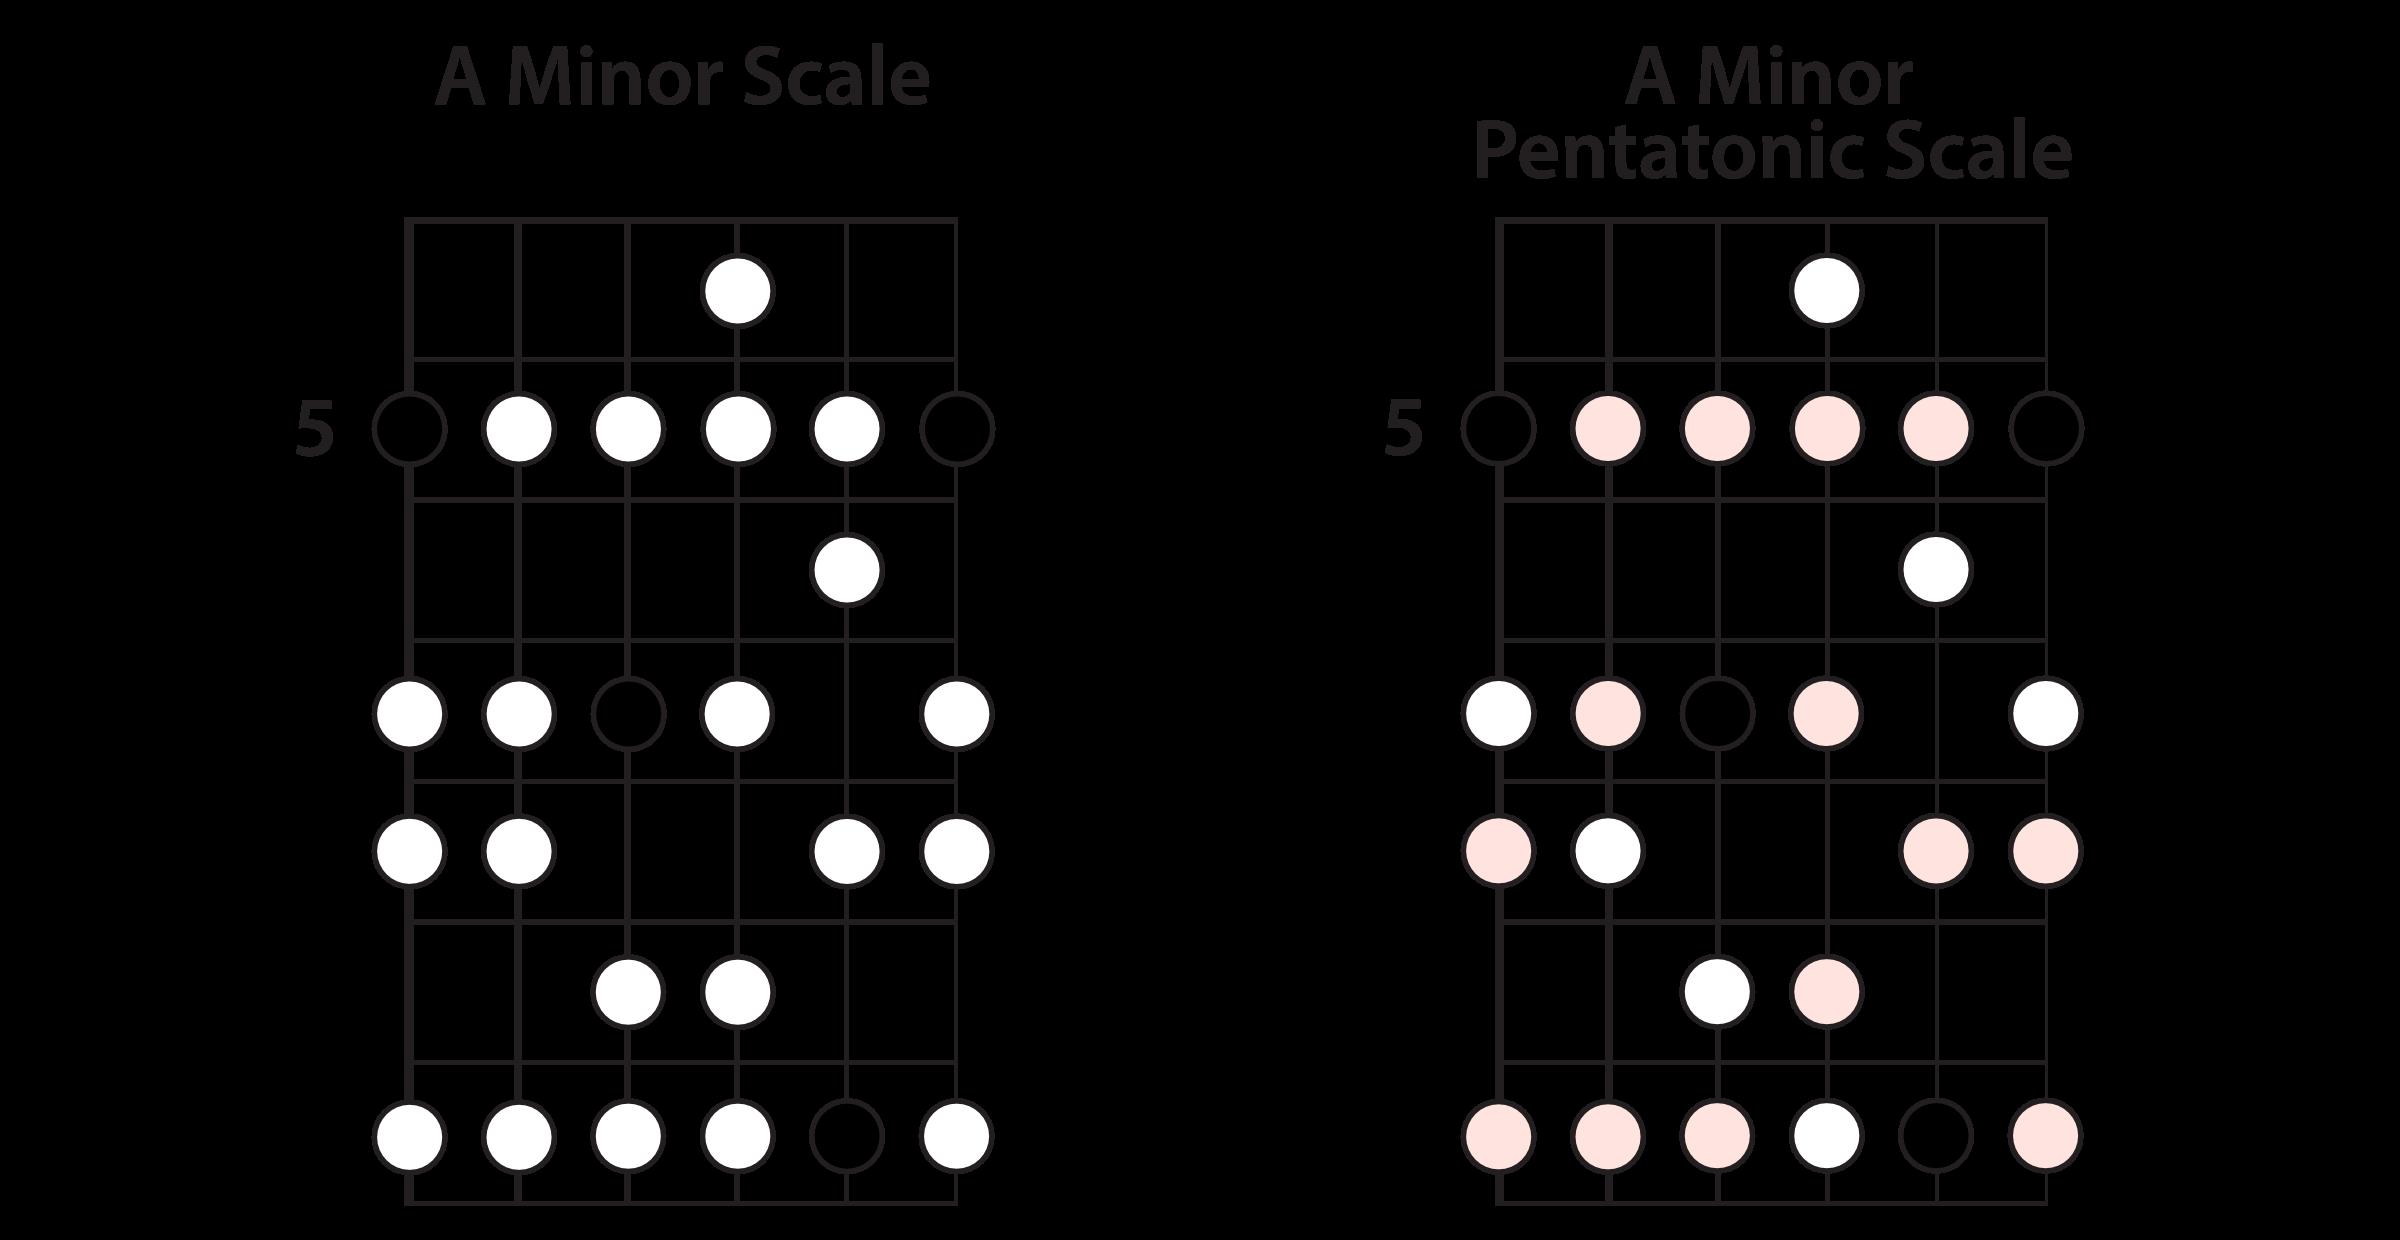 The A Minor Scale & The A Minor Pentatonic Scale